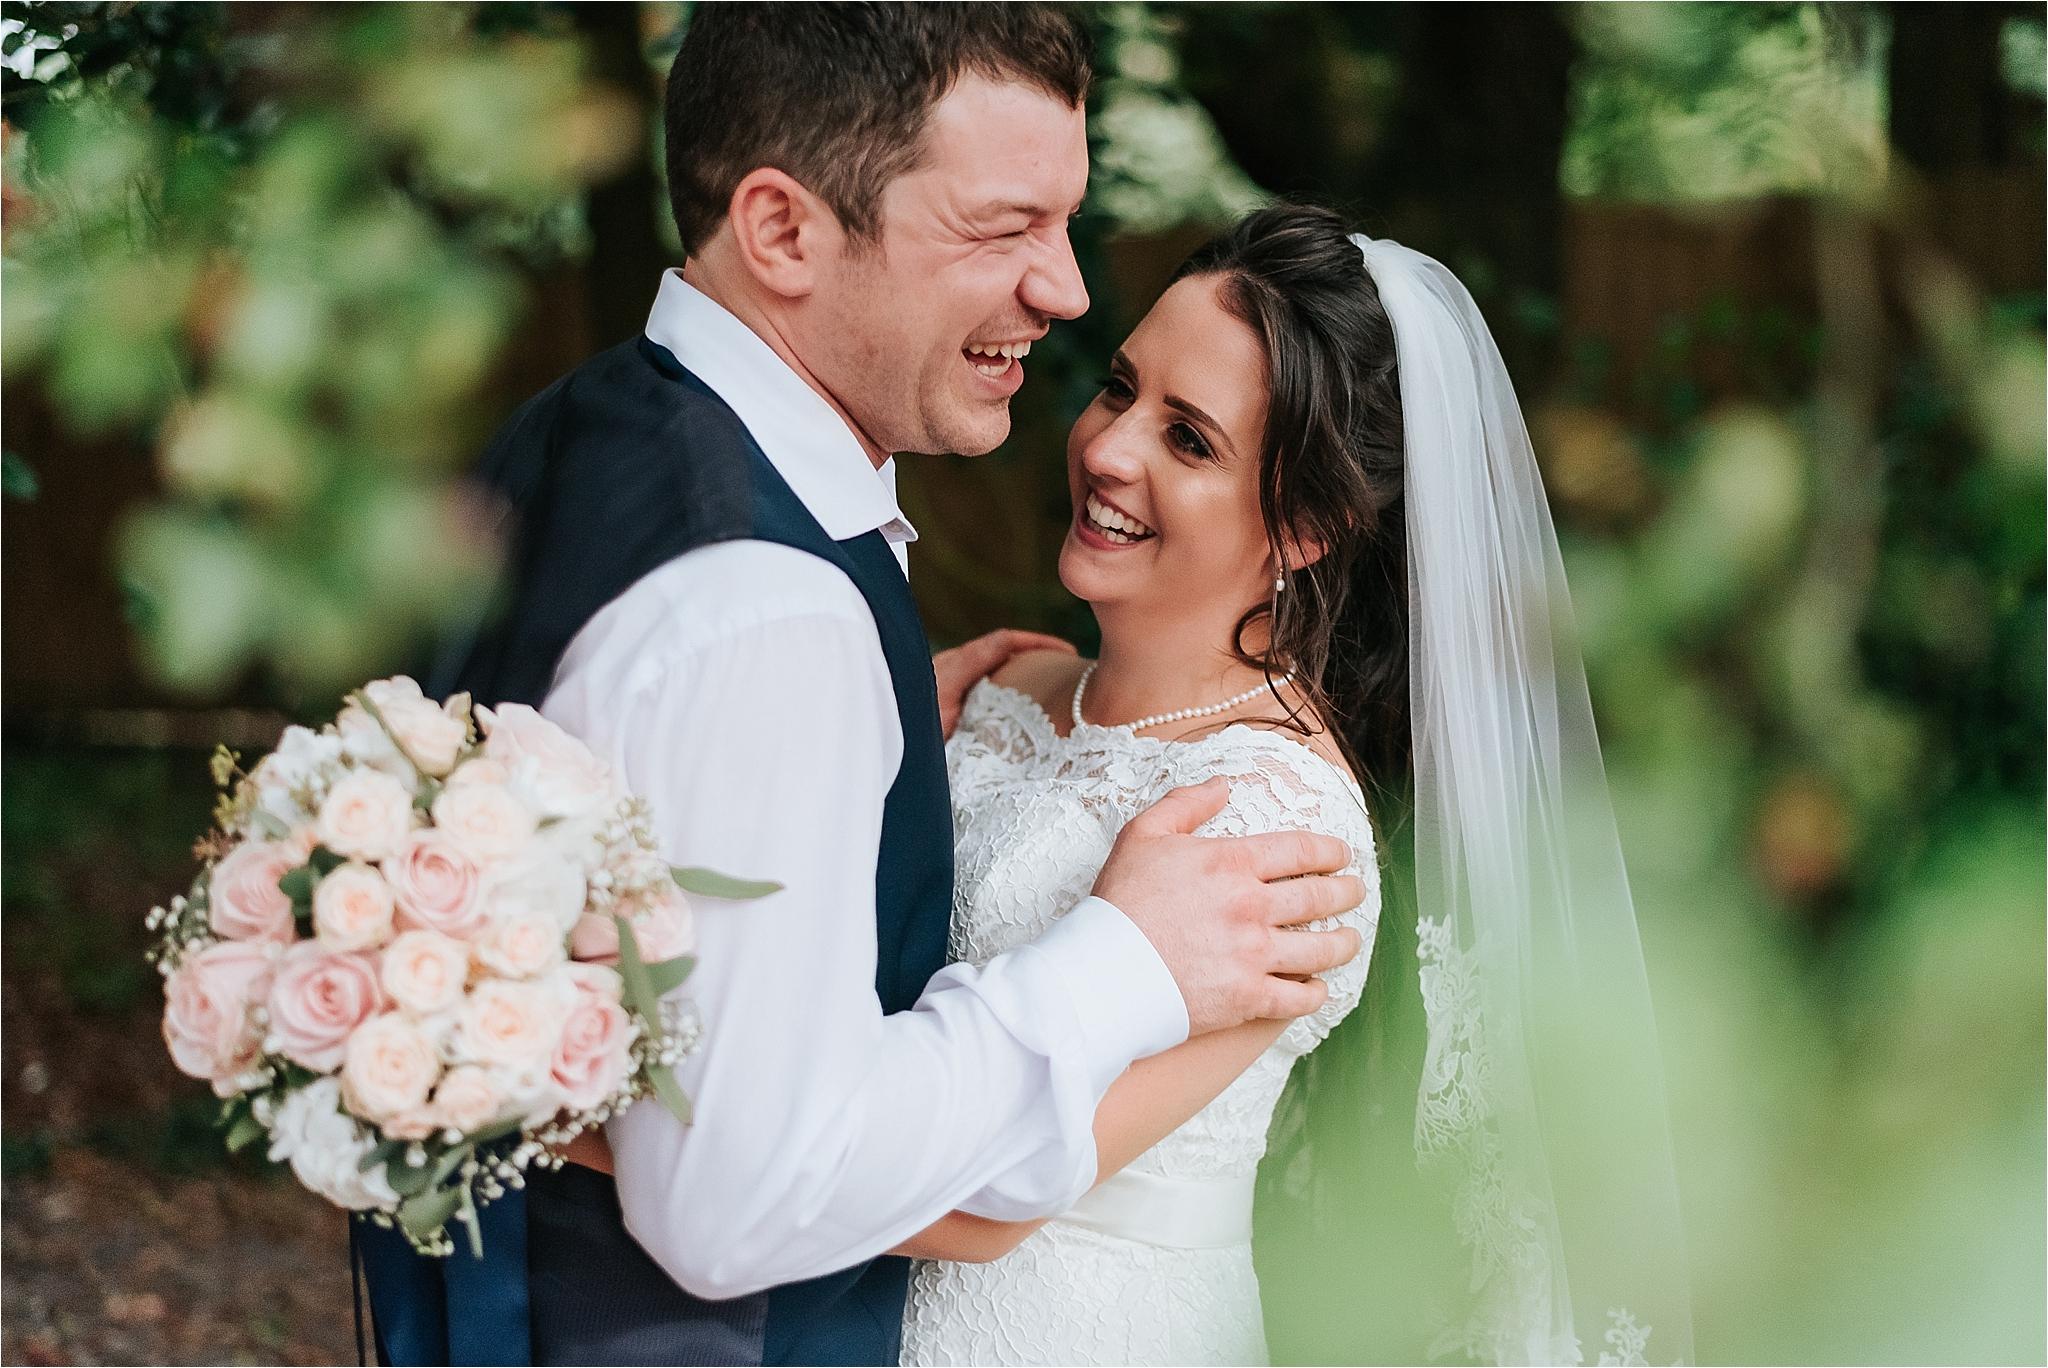 thevilla+lancashire+wreagreen+wedding+photographer66.jpg